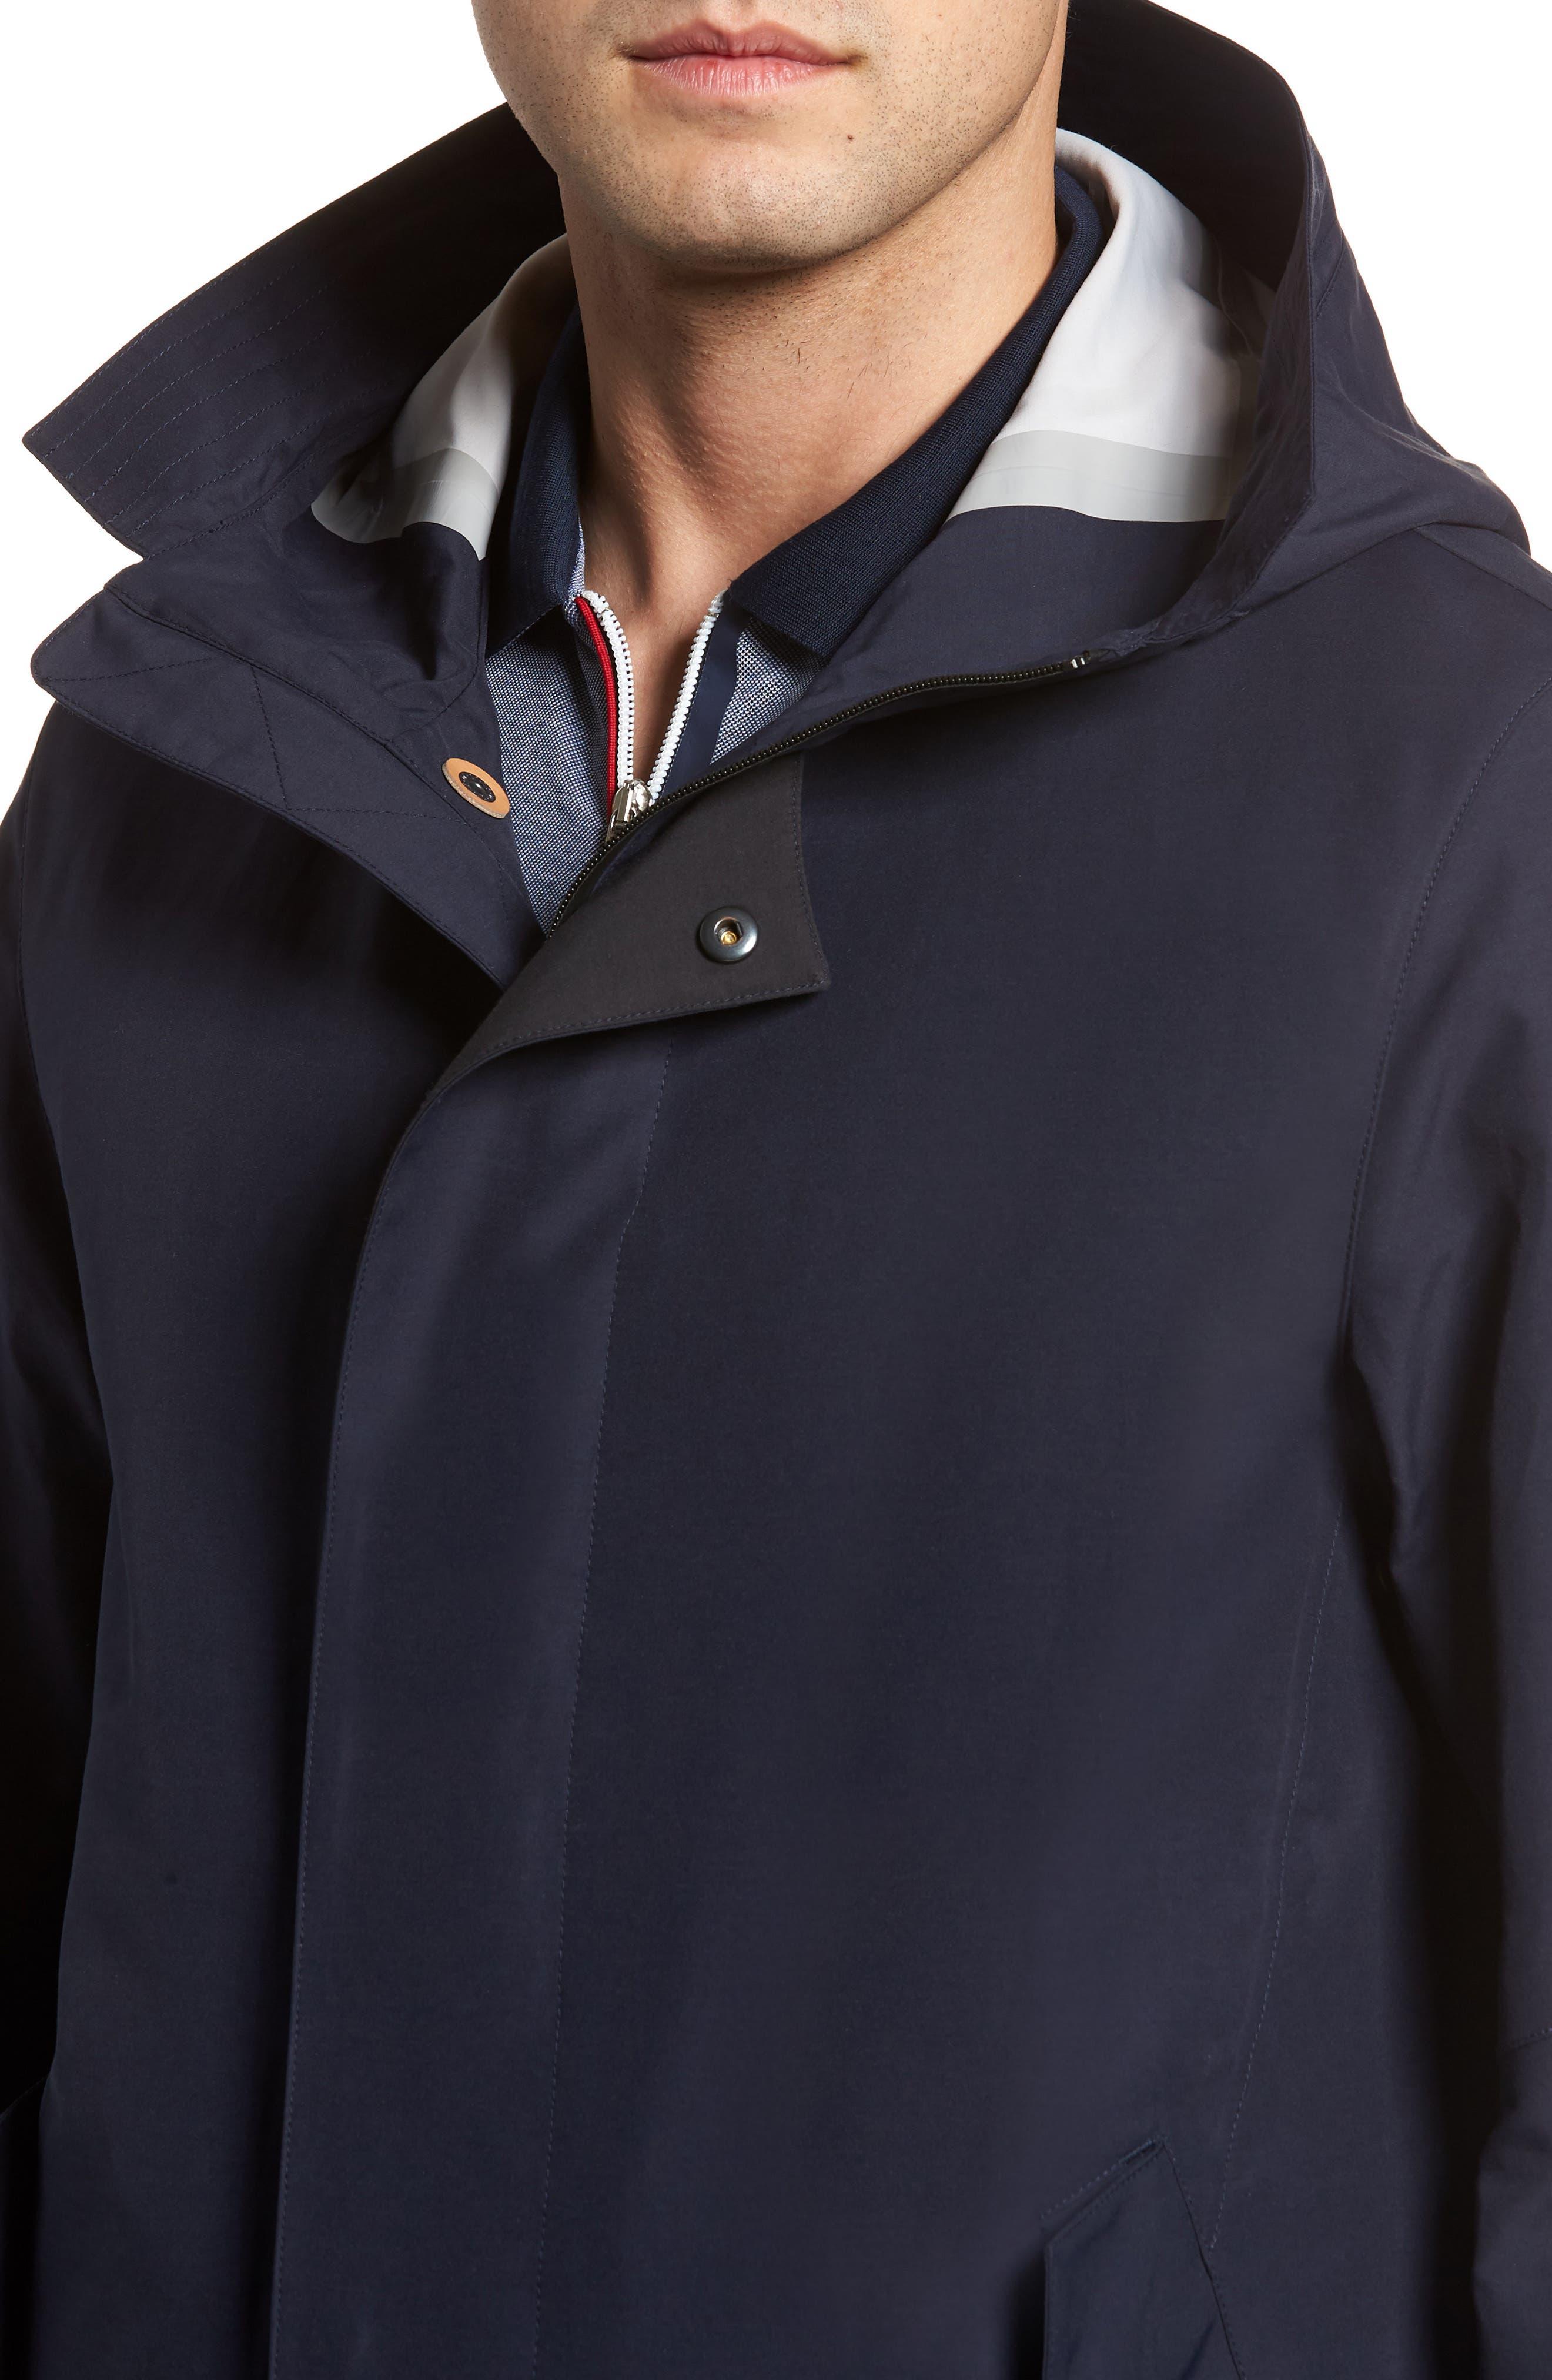 Bonded Cotton Blend Rain Jacket,                             Alternate thumbnail 4, color,                             NAVY